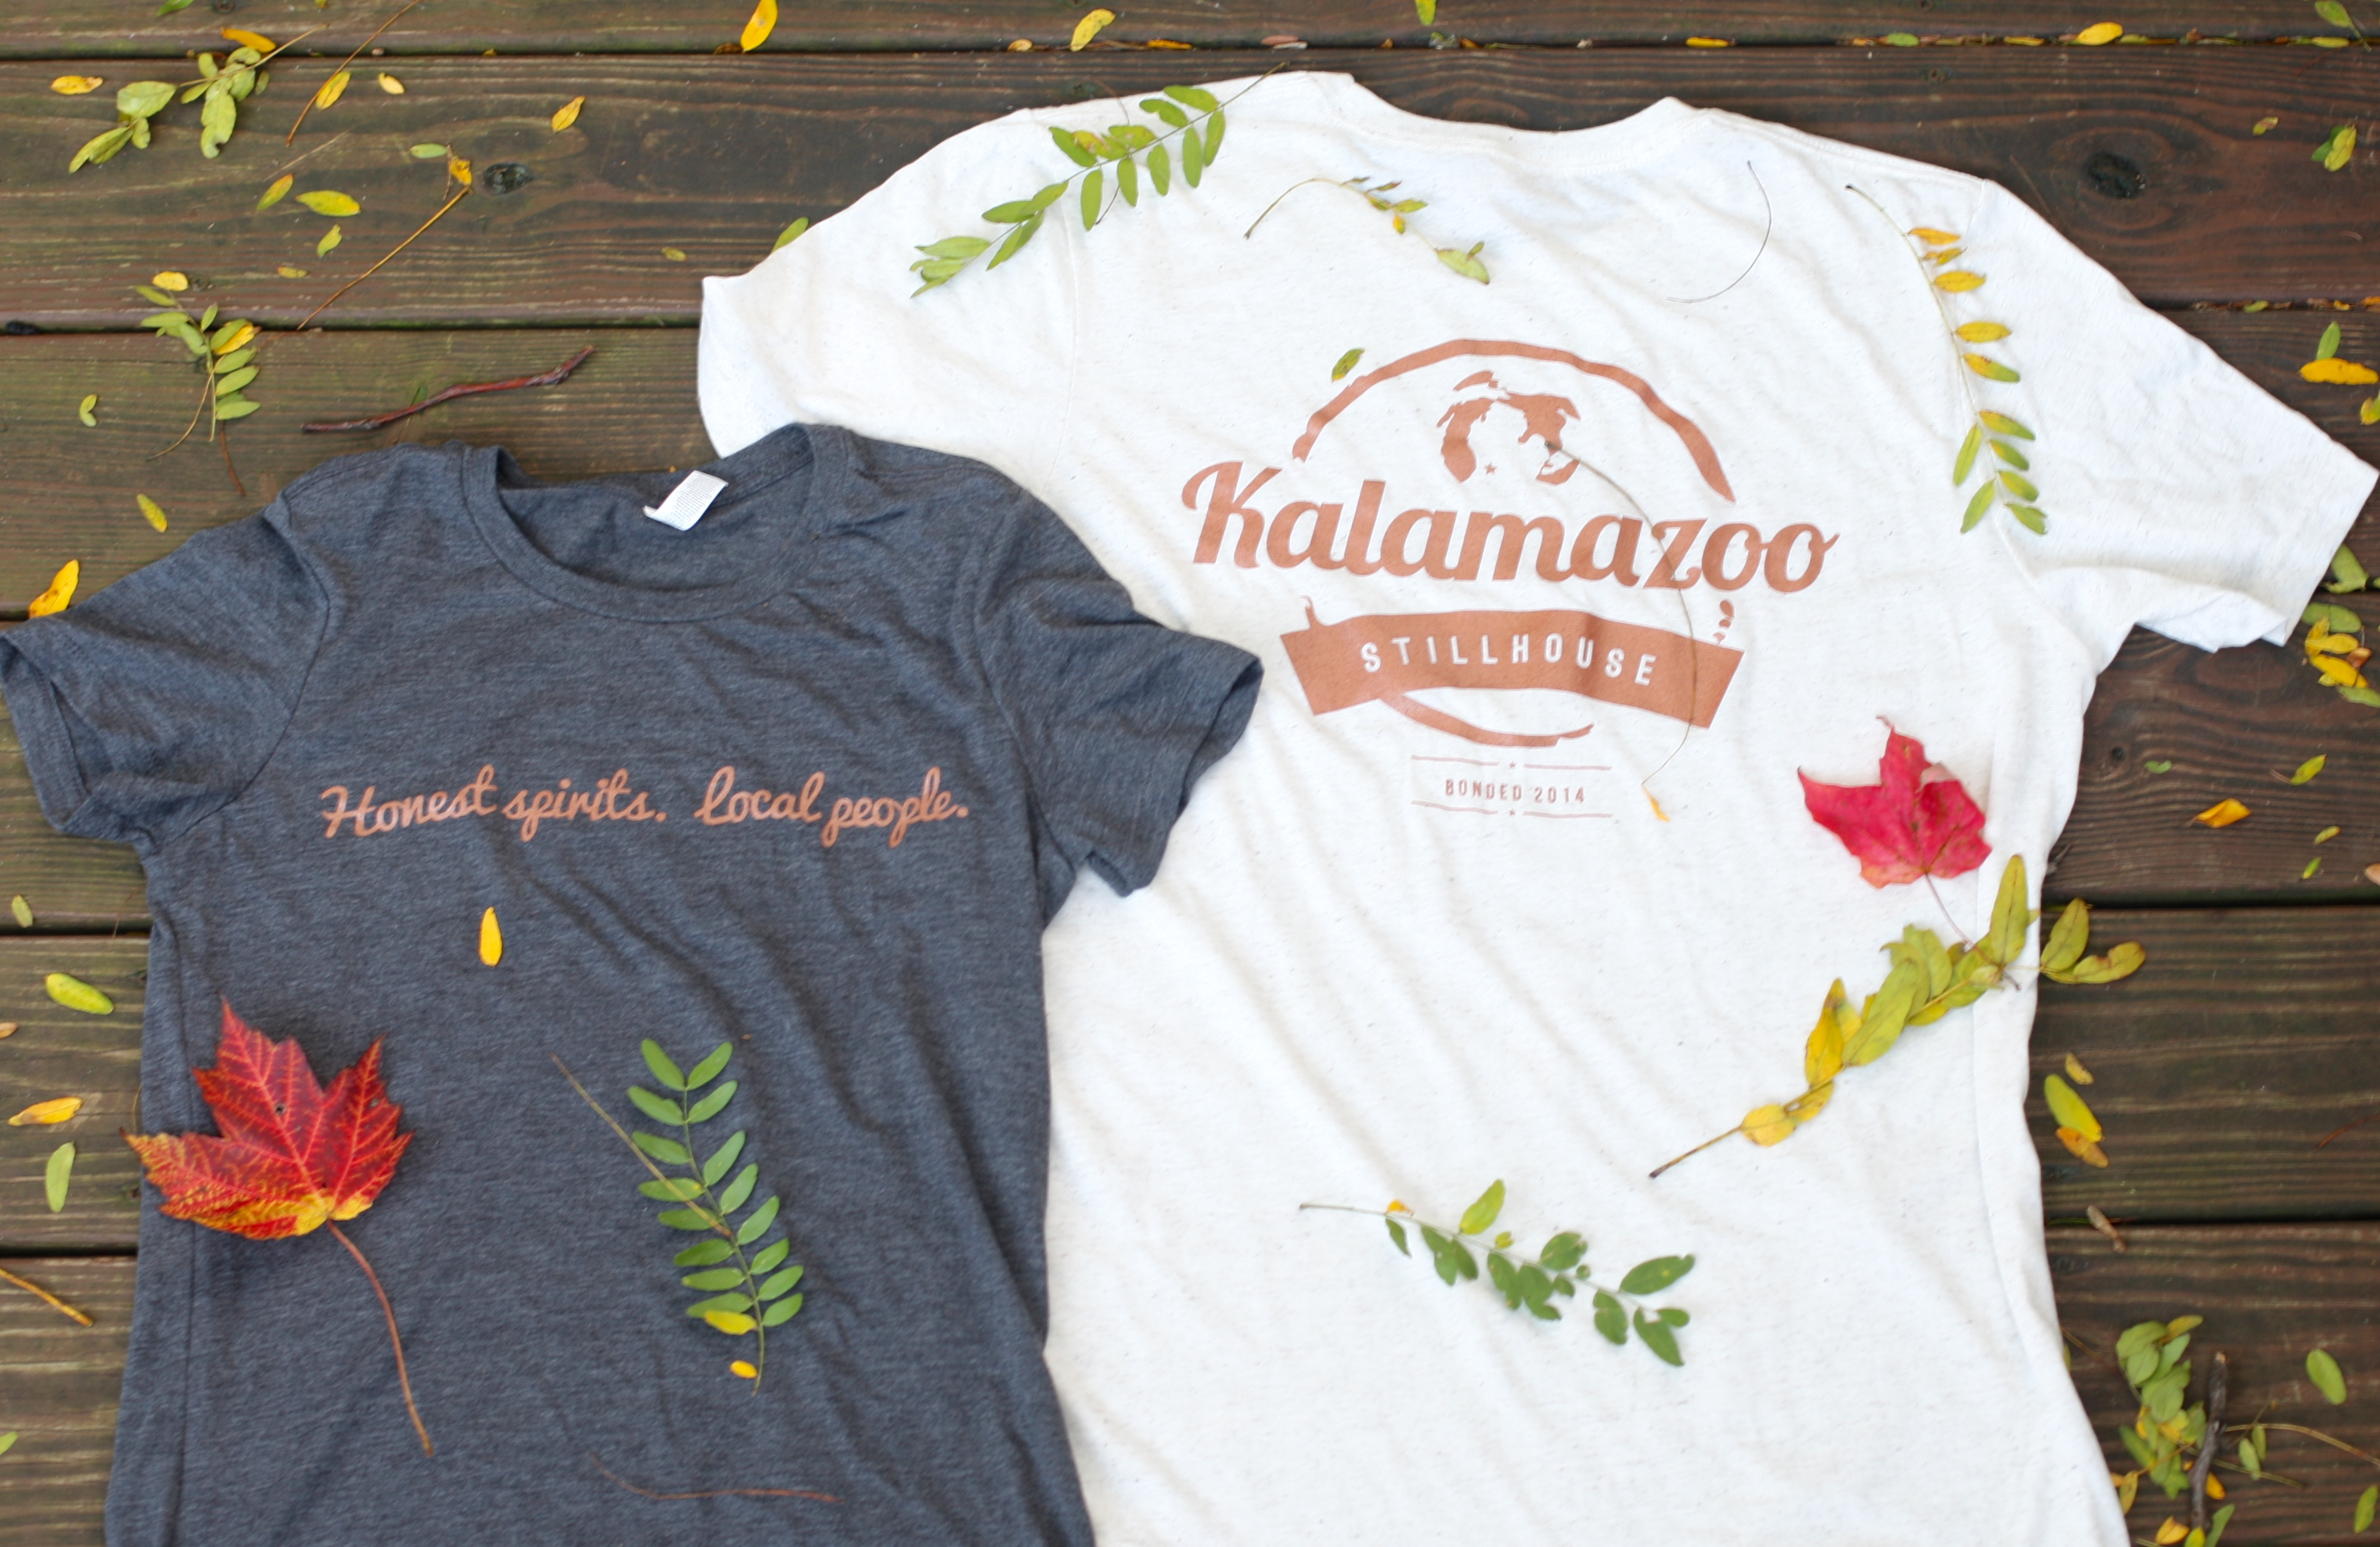 The Kalamazoo Stillhouse Fine Handcrafted Spirits Honest Spirits